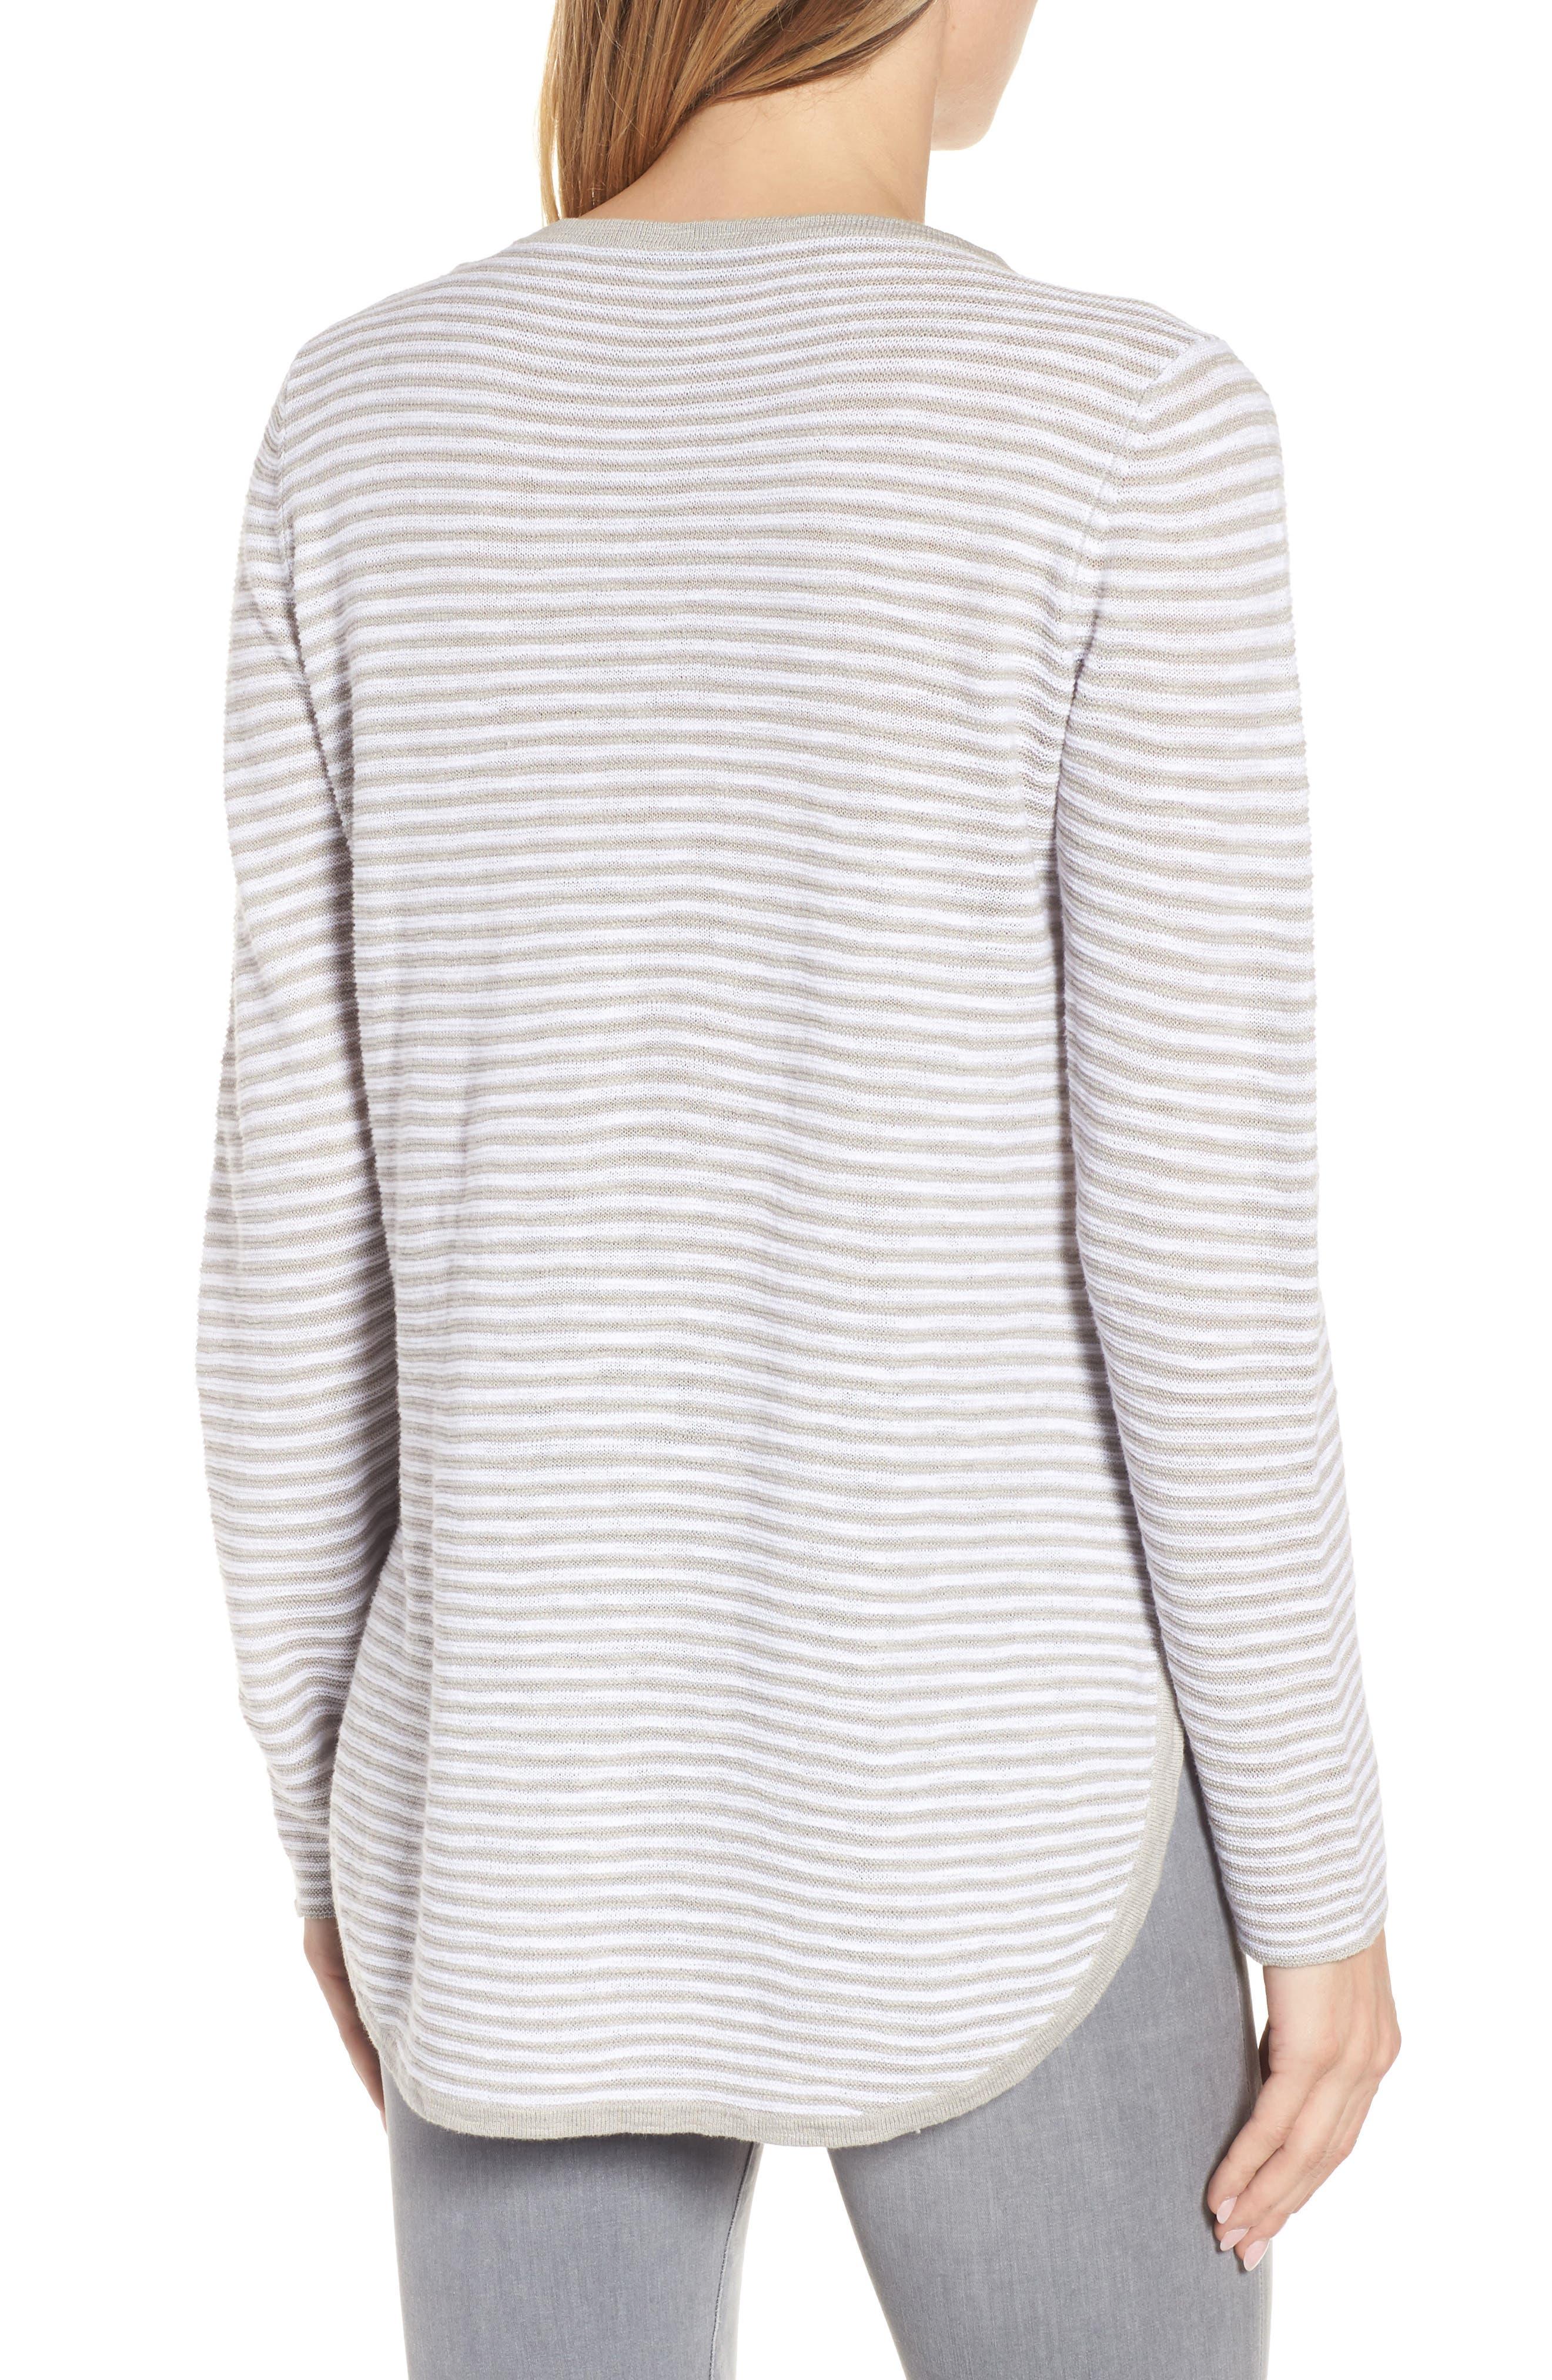 Stripe Organic Linen & Cotton Sweater,                             Alternate thumbnail 2, color,                             192